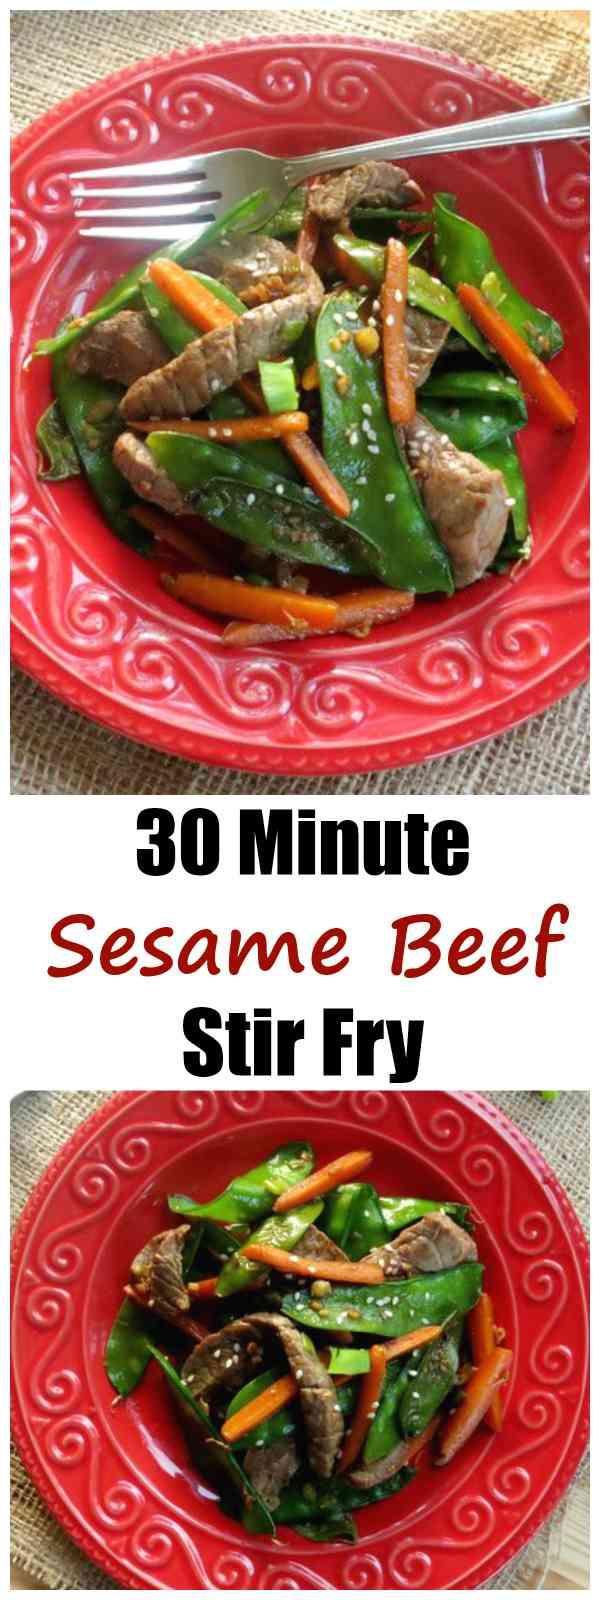 Sesame Beef Stir Fry with Sesame Oil